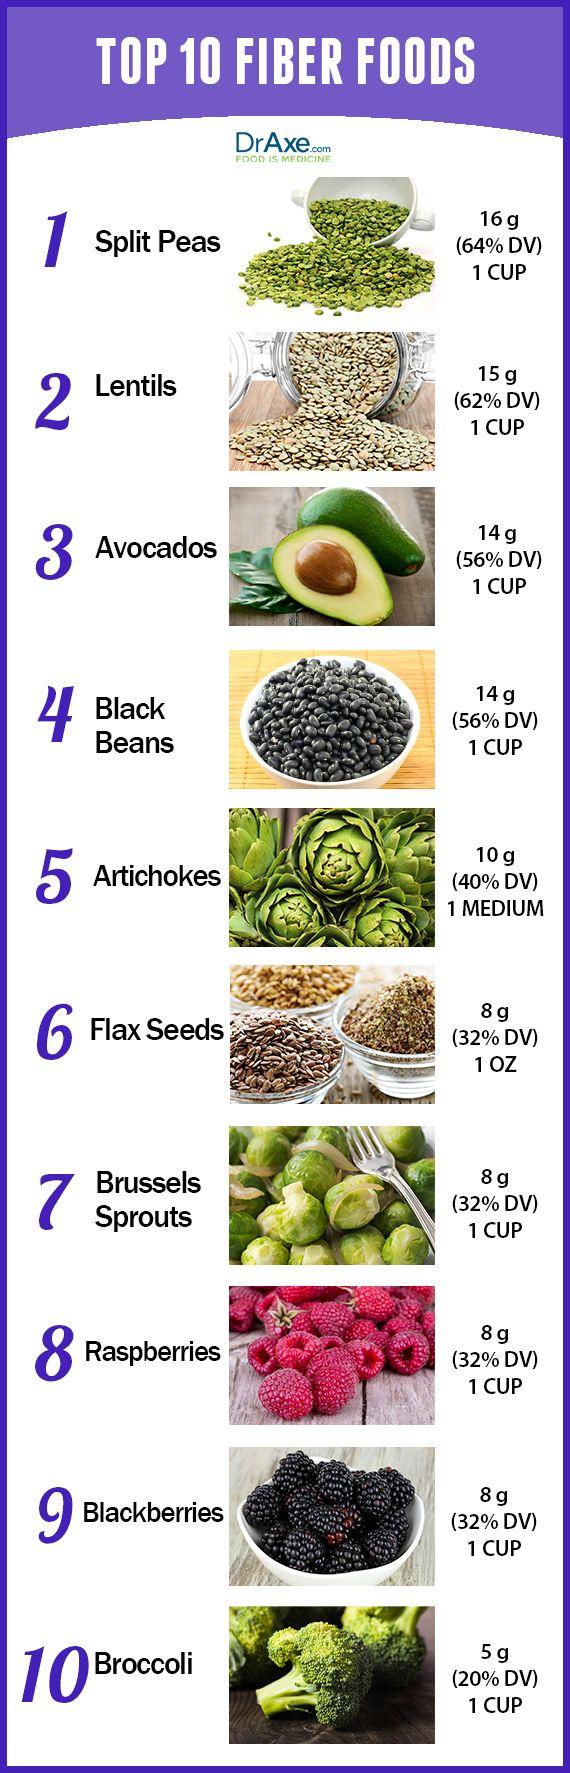 www.littlevendorathletics.com Top 10 High Fiber Foods - DrAxe.com